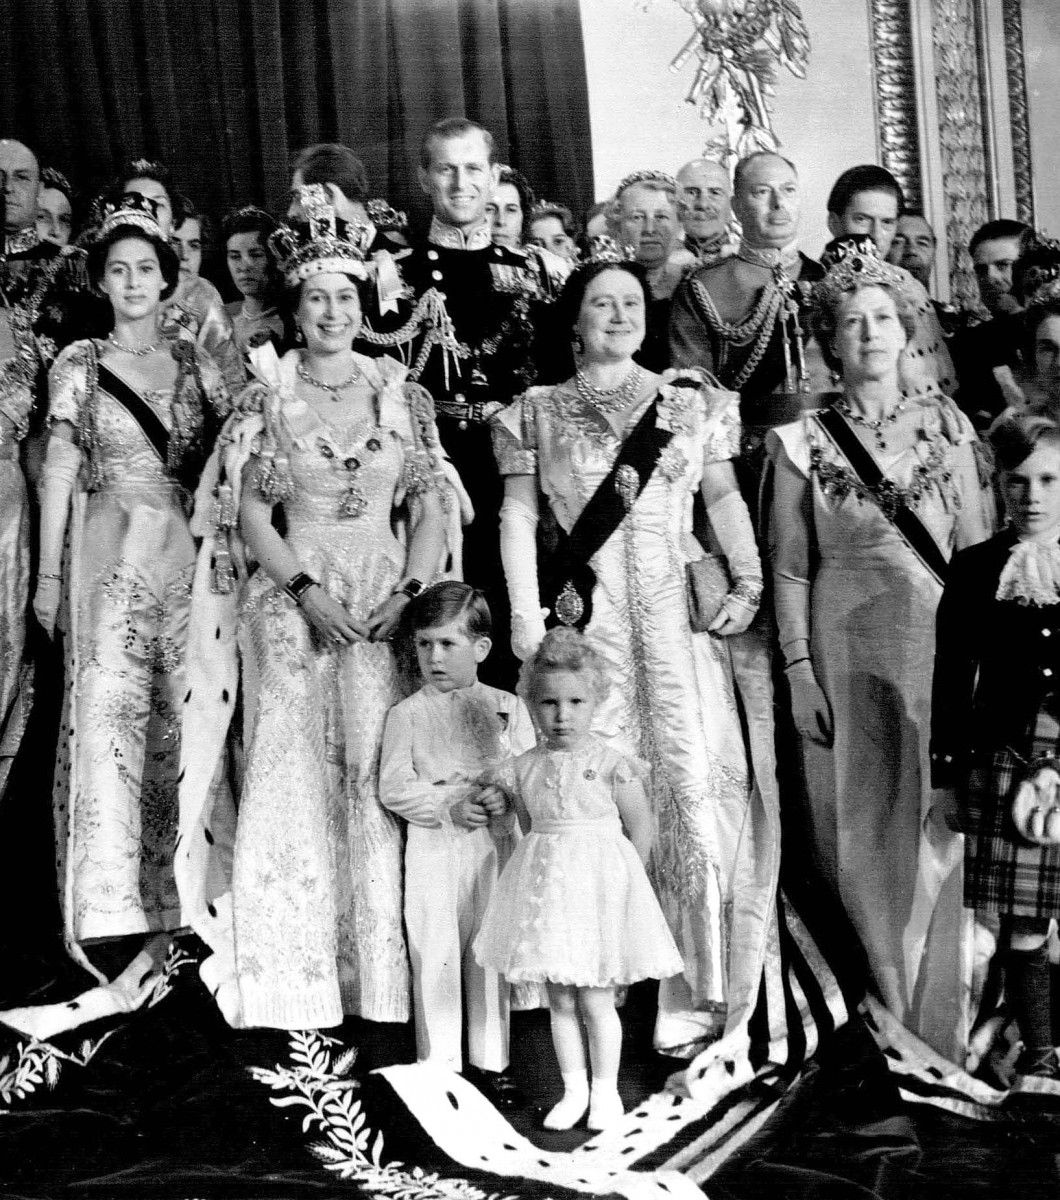 A Look Back At Coronation Day In 1953 Royalista Queen Elizabeth Elizabeth Ii Her Majesty The Queen